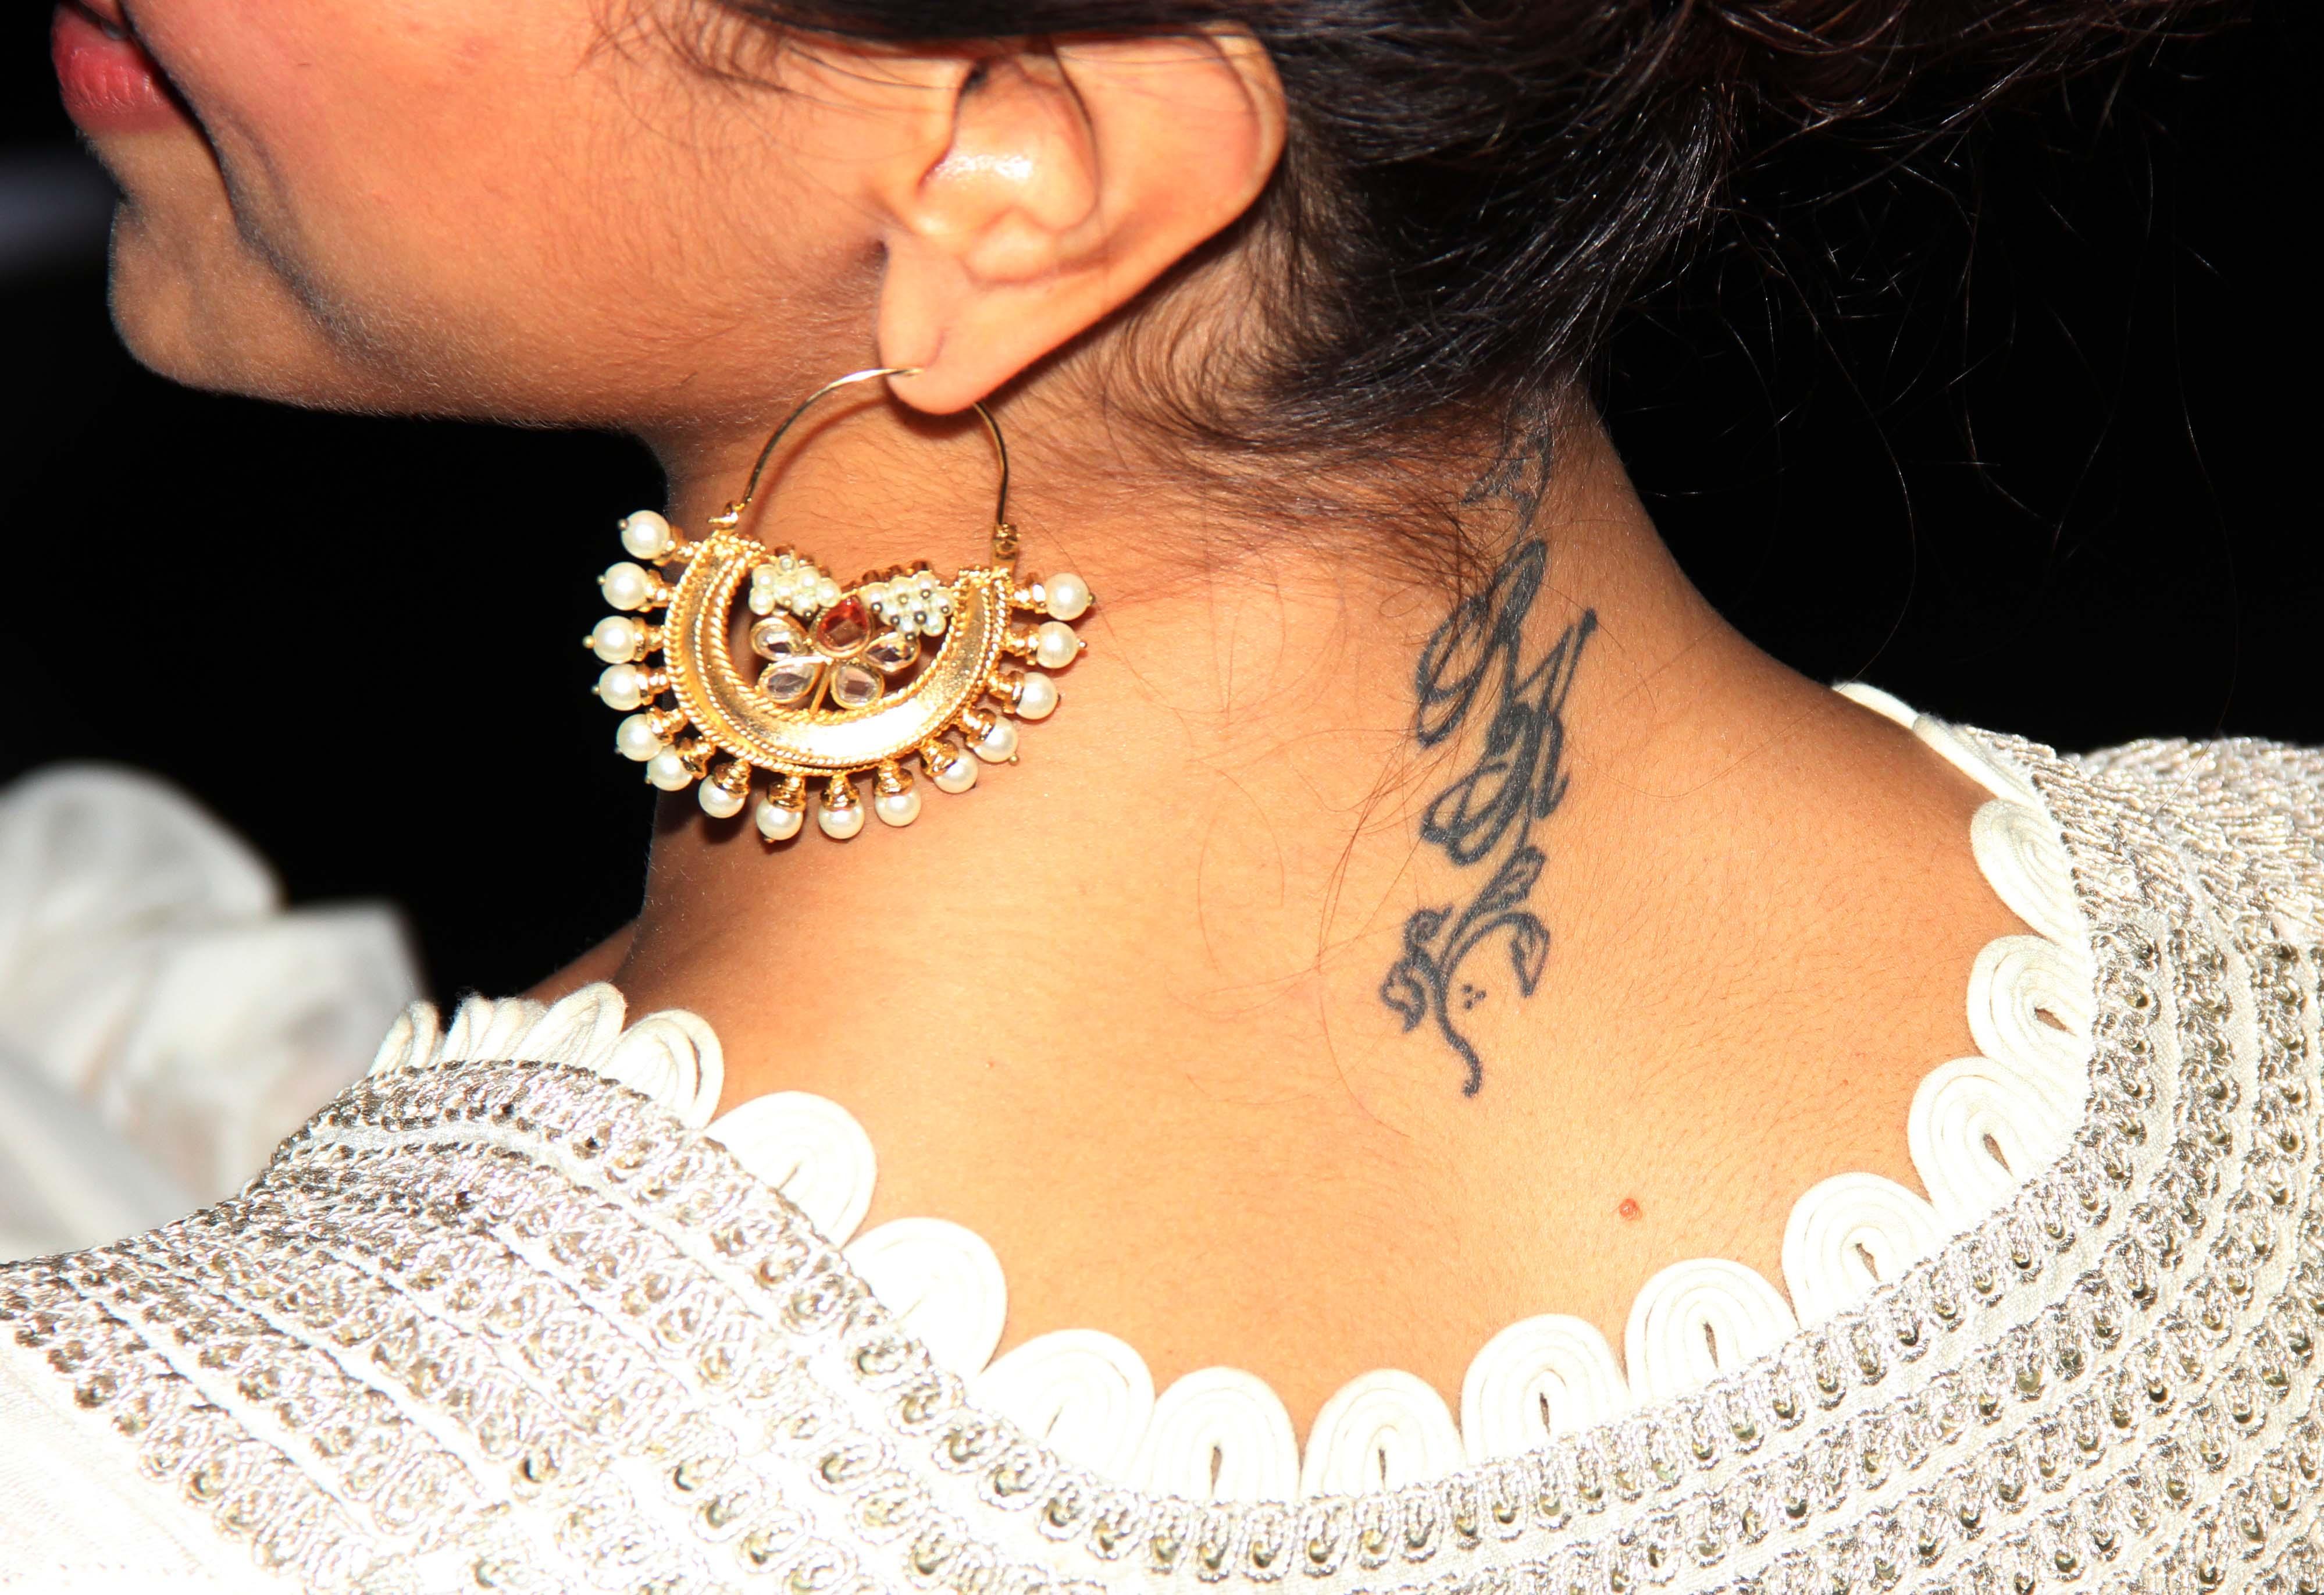 Deepika Padukone with a tattoo of RK.